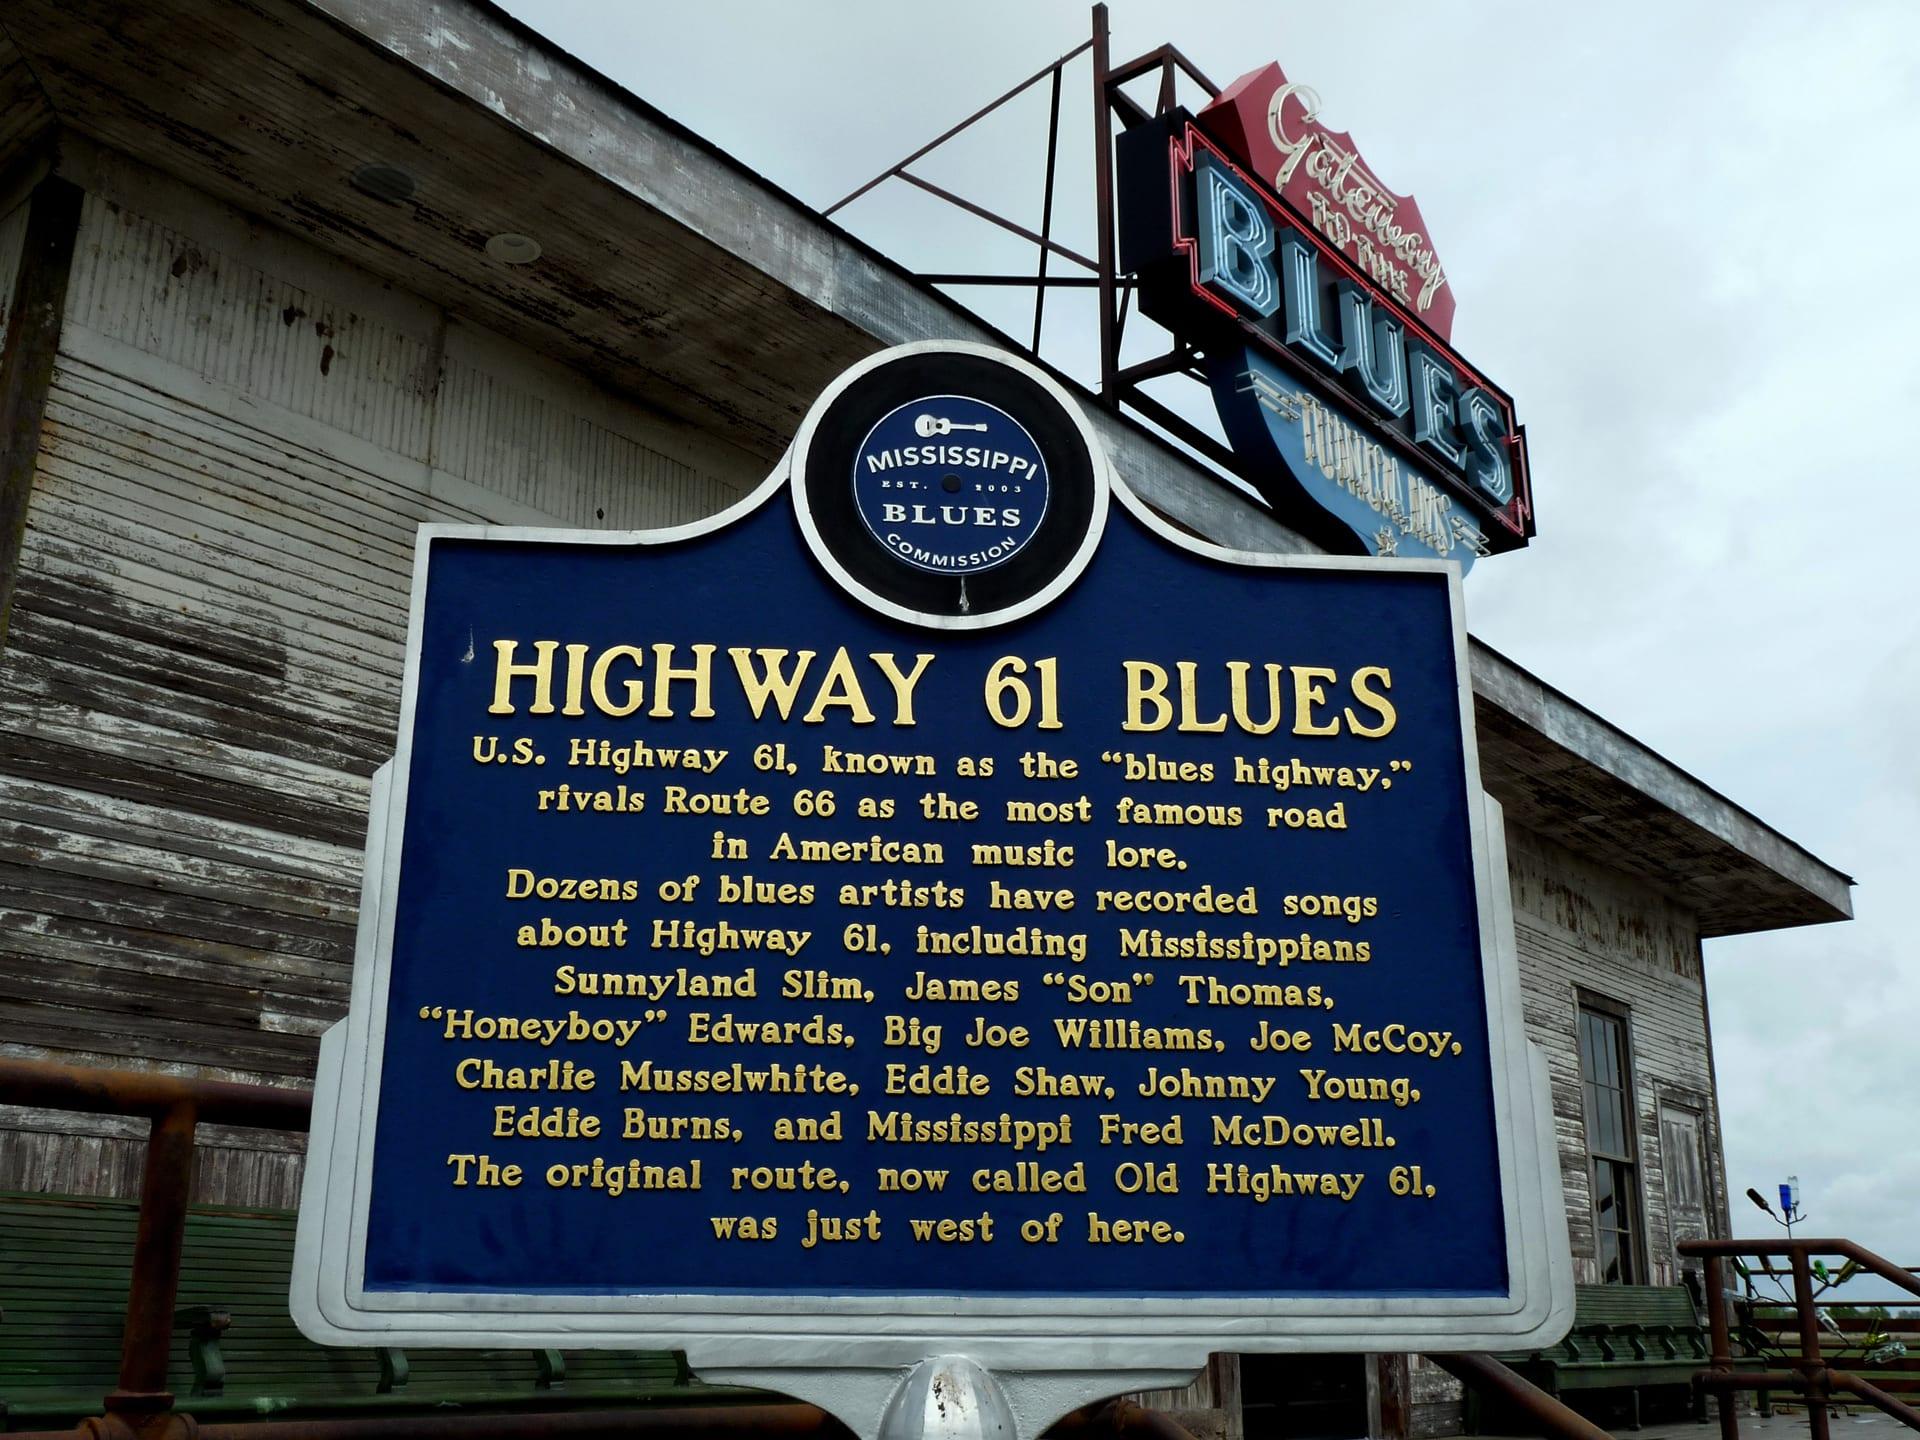 Mississippi Blues Trail marker for Highway 61